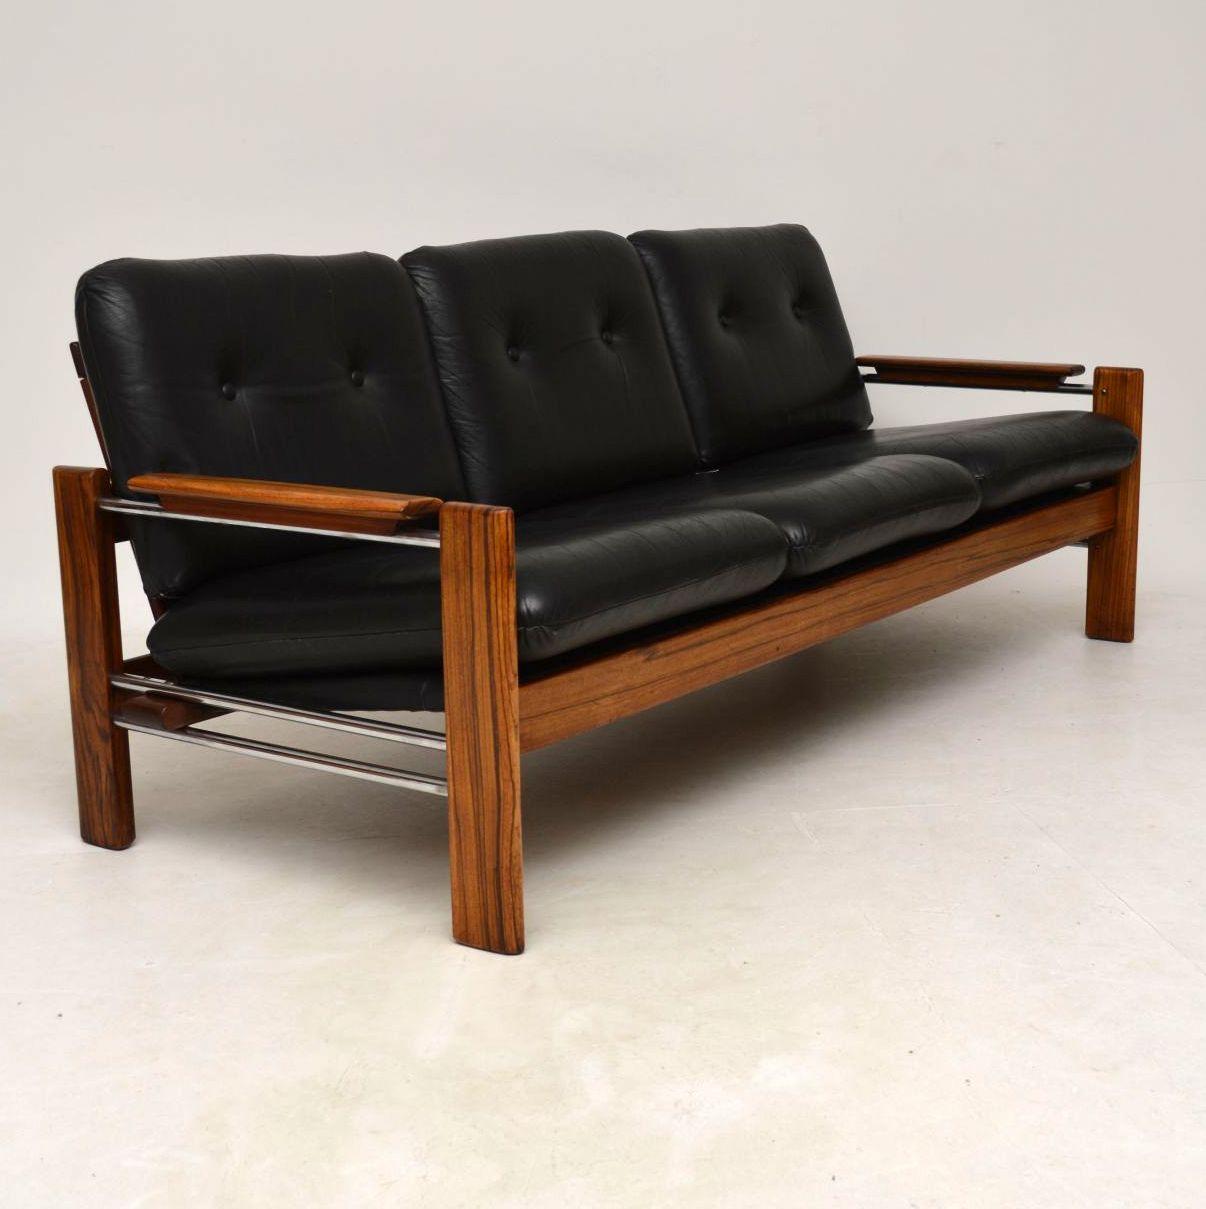 1960's Walnut, Leather & Chrome Vintage Sofa